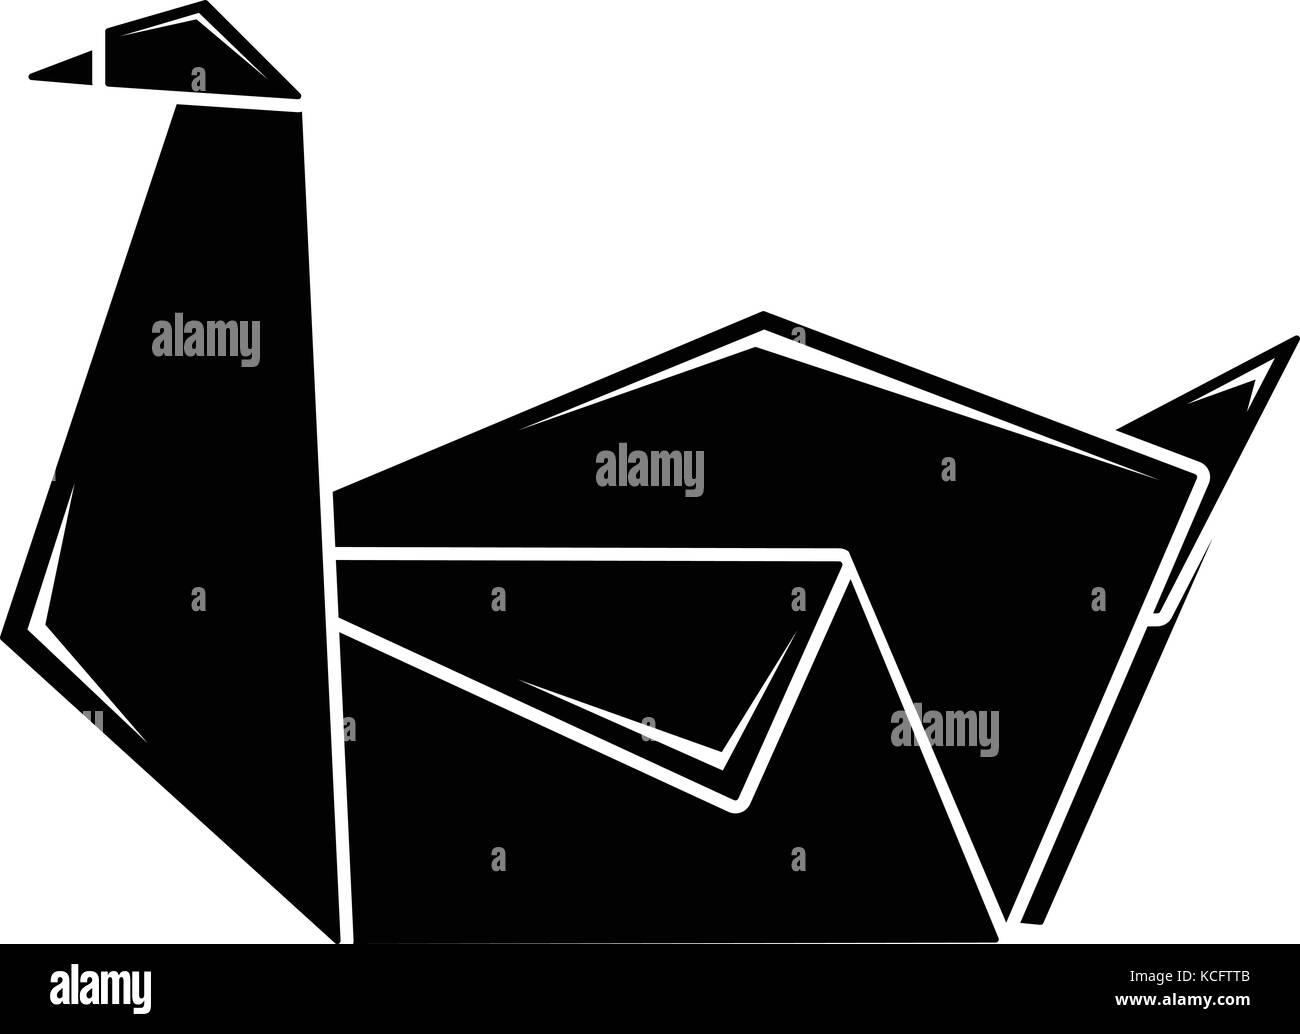 Origami Swan Icon Simple Black Style Stock Vector Art Pics Photos Diagrams